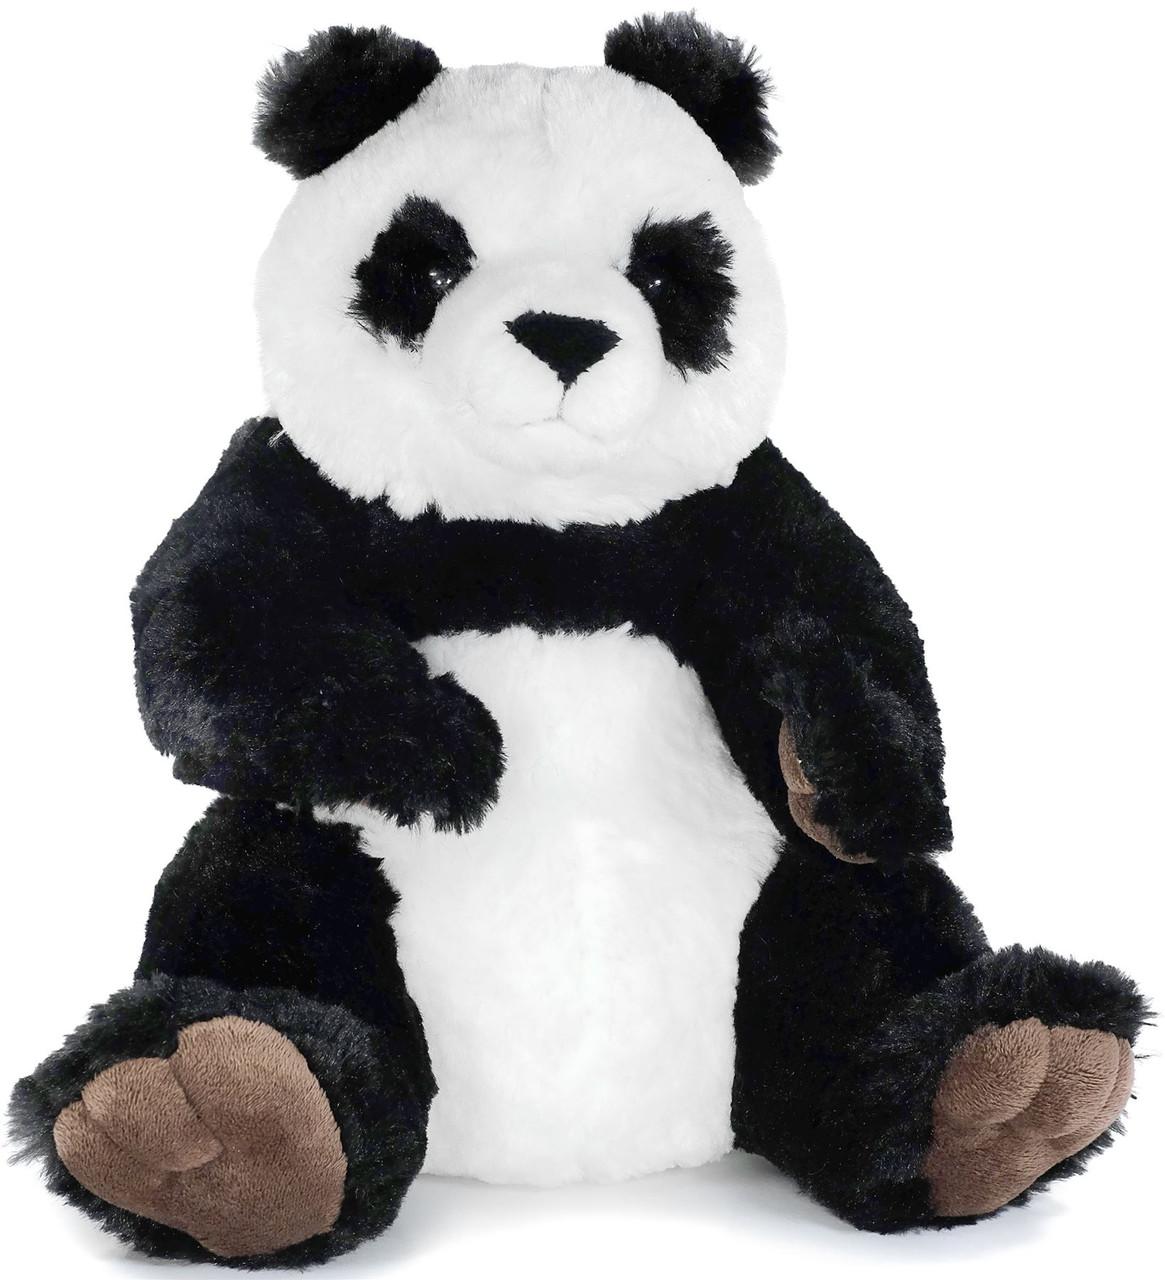 Ma The Panda 10 Inch Stuffed Animal Plush Bear By Tiger Tale